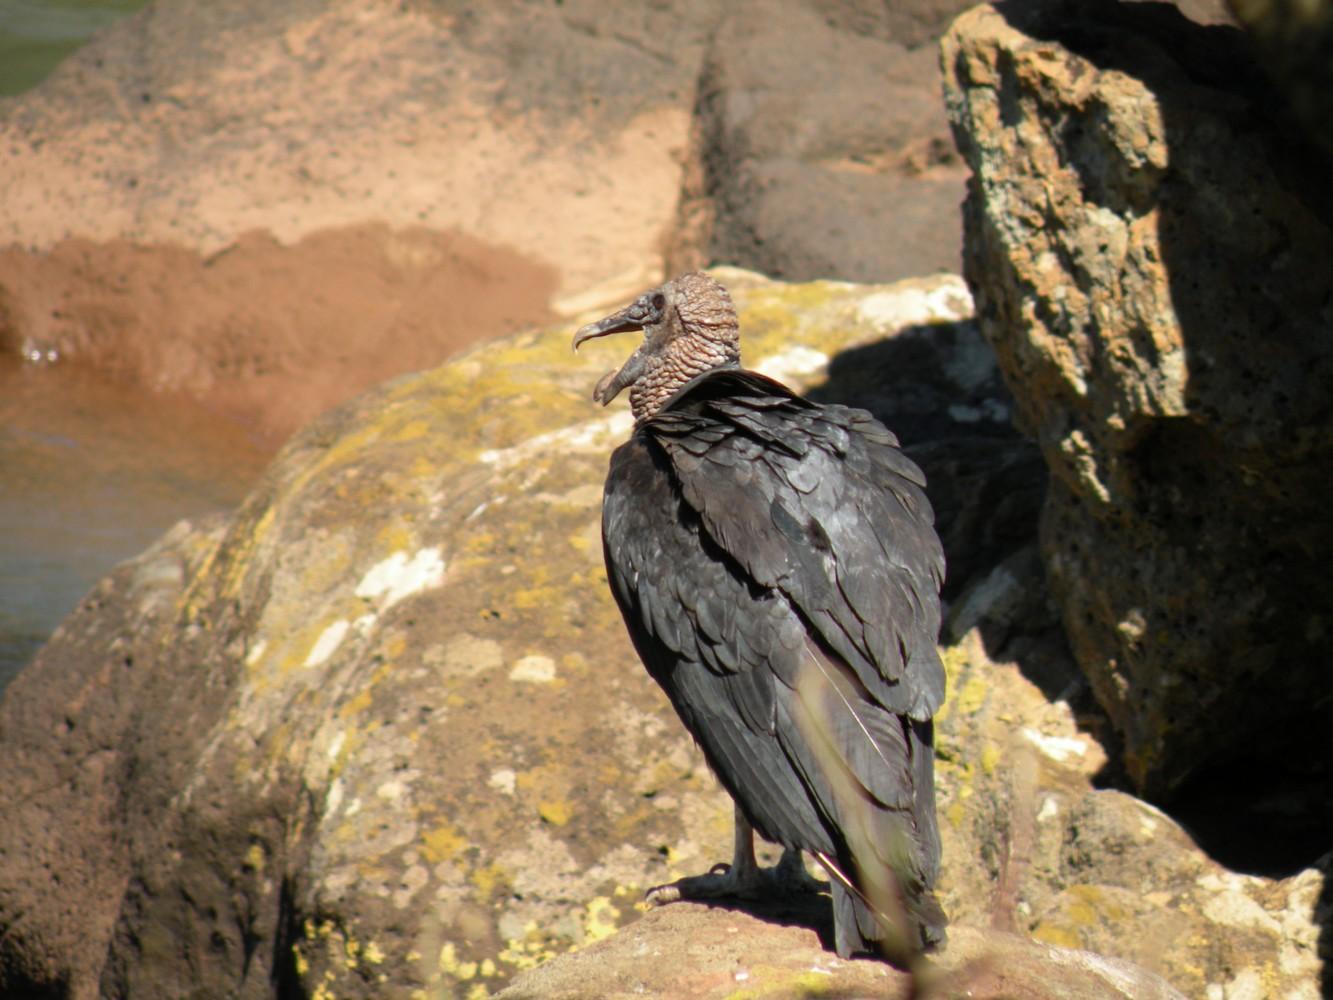 Oiseau Isla San Martin - Parque Nacional Iguazú